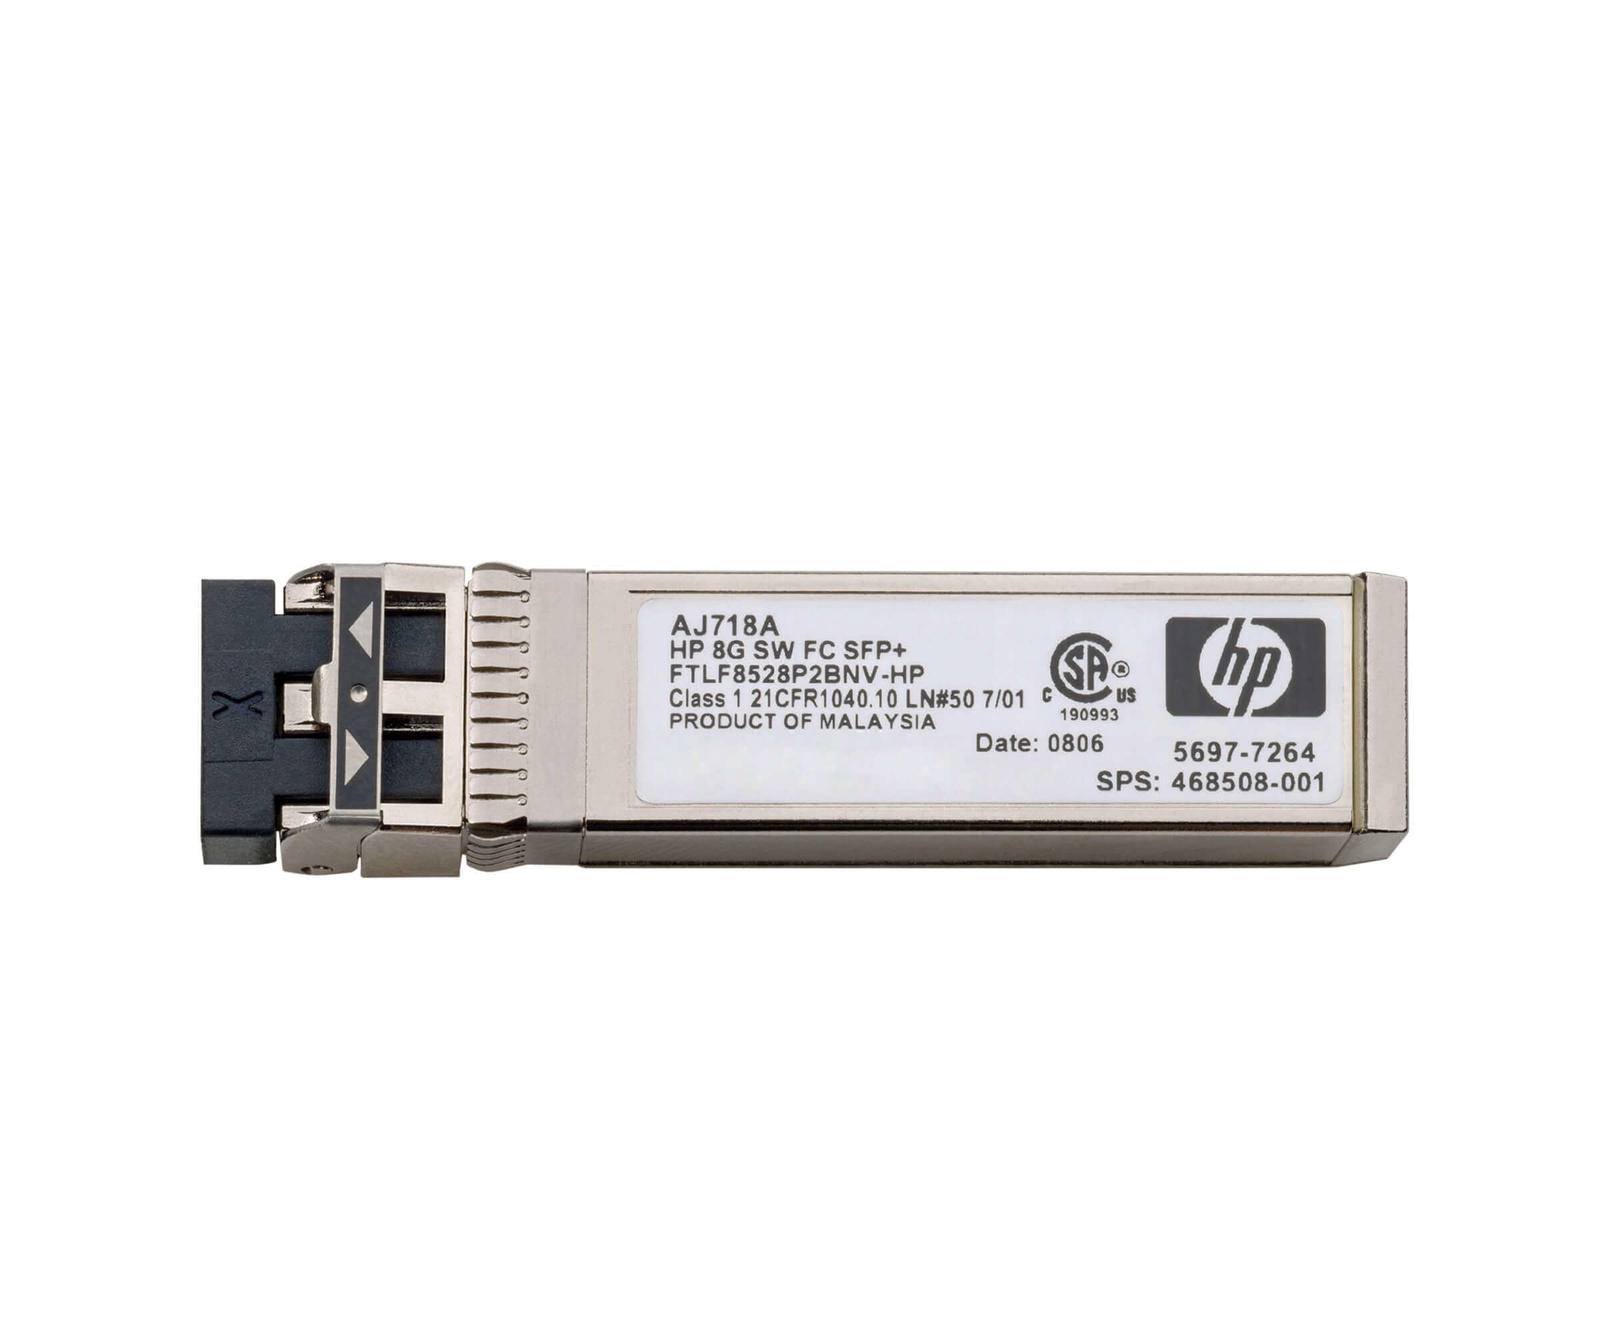 Трансивер HP AJ718A SFP+ 468508-001, 5697-7264 трансивер hp 8gb short wave transceiver kit 4 pk c8r23a c8r23a